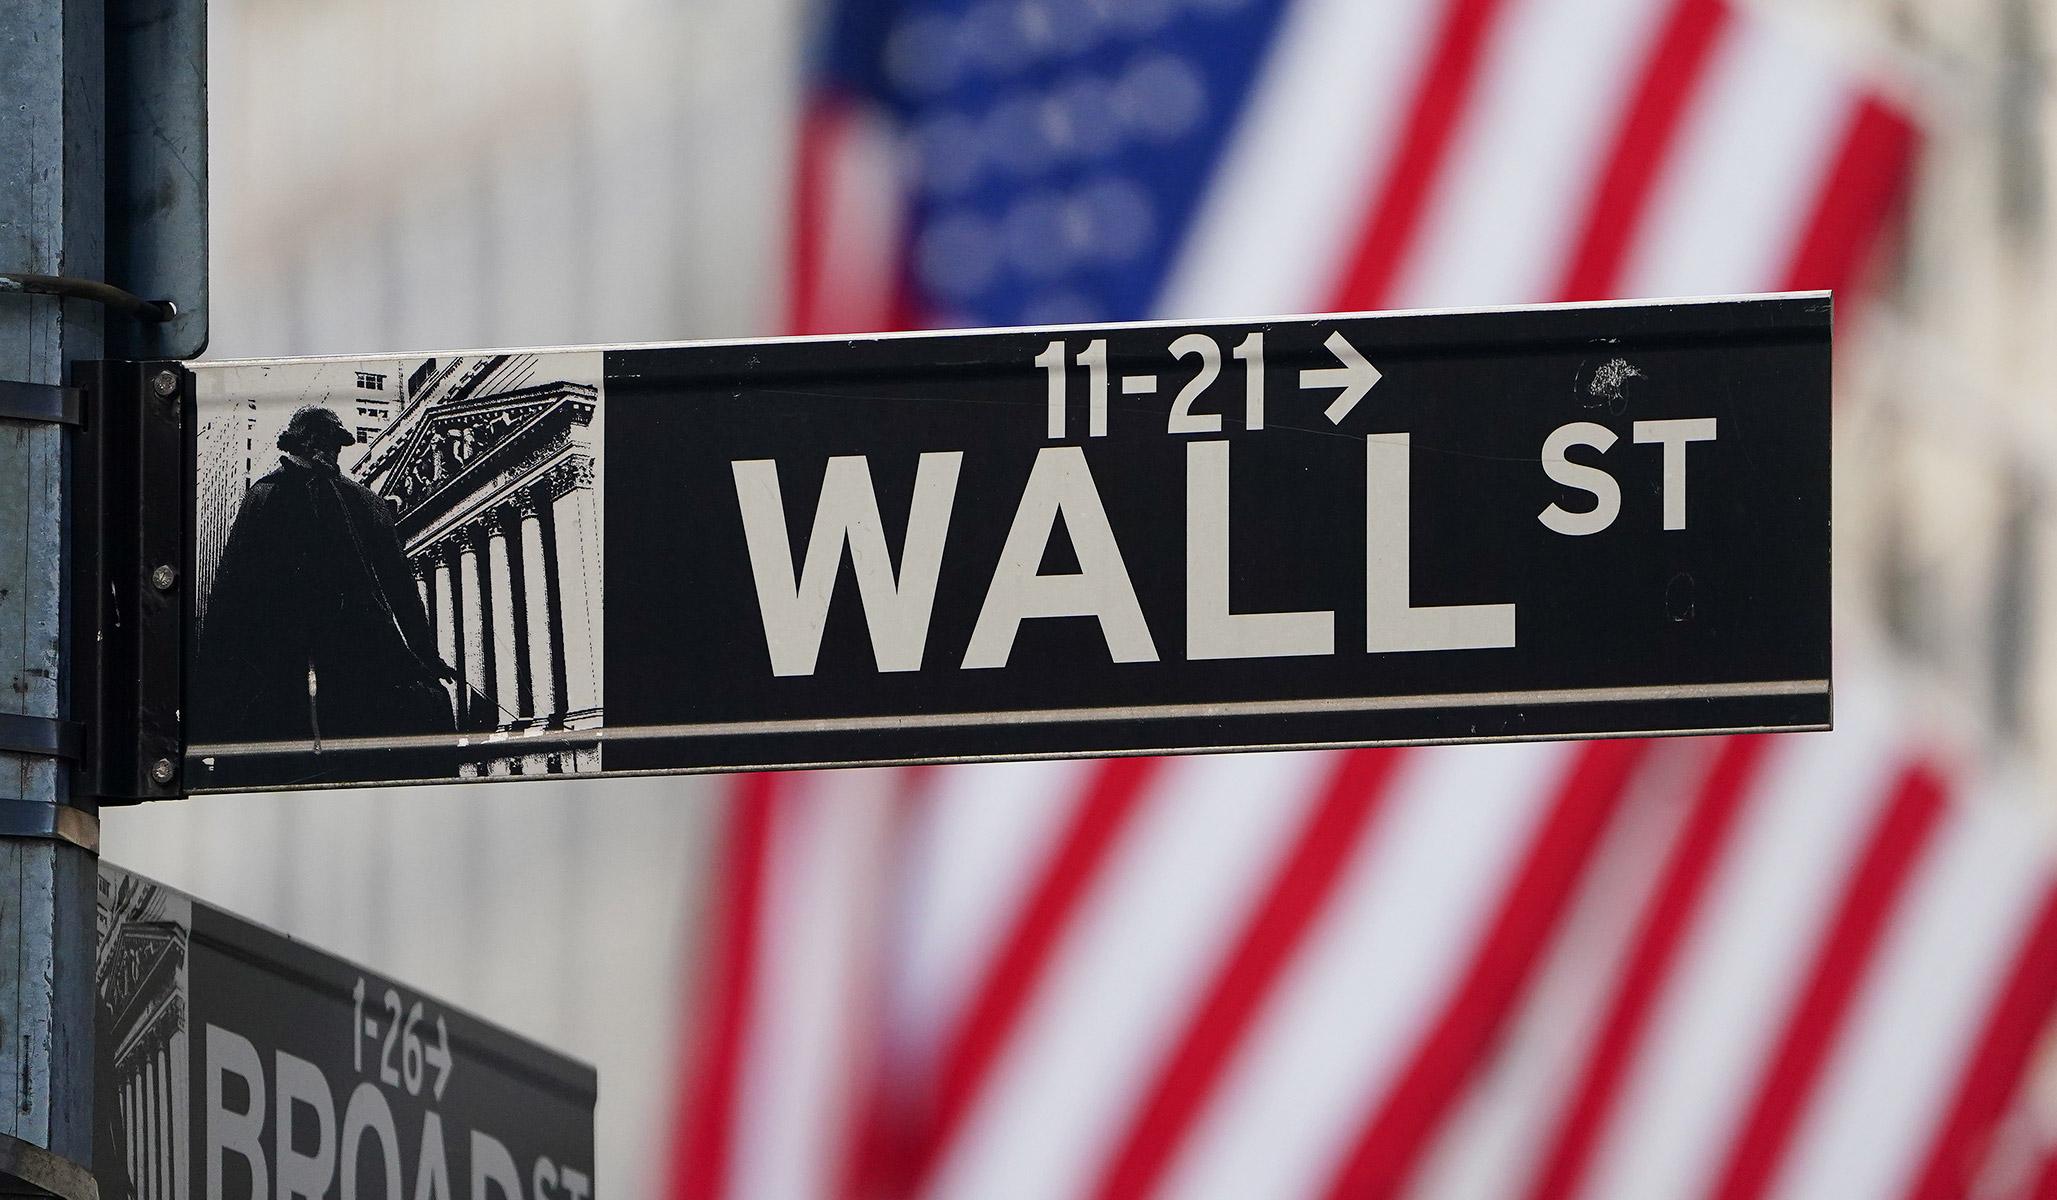 U.S. Economy Grows 6.5 Percent in Second Quarter, Surpassing Pre-Pandemic Level